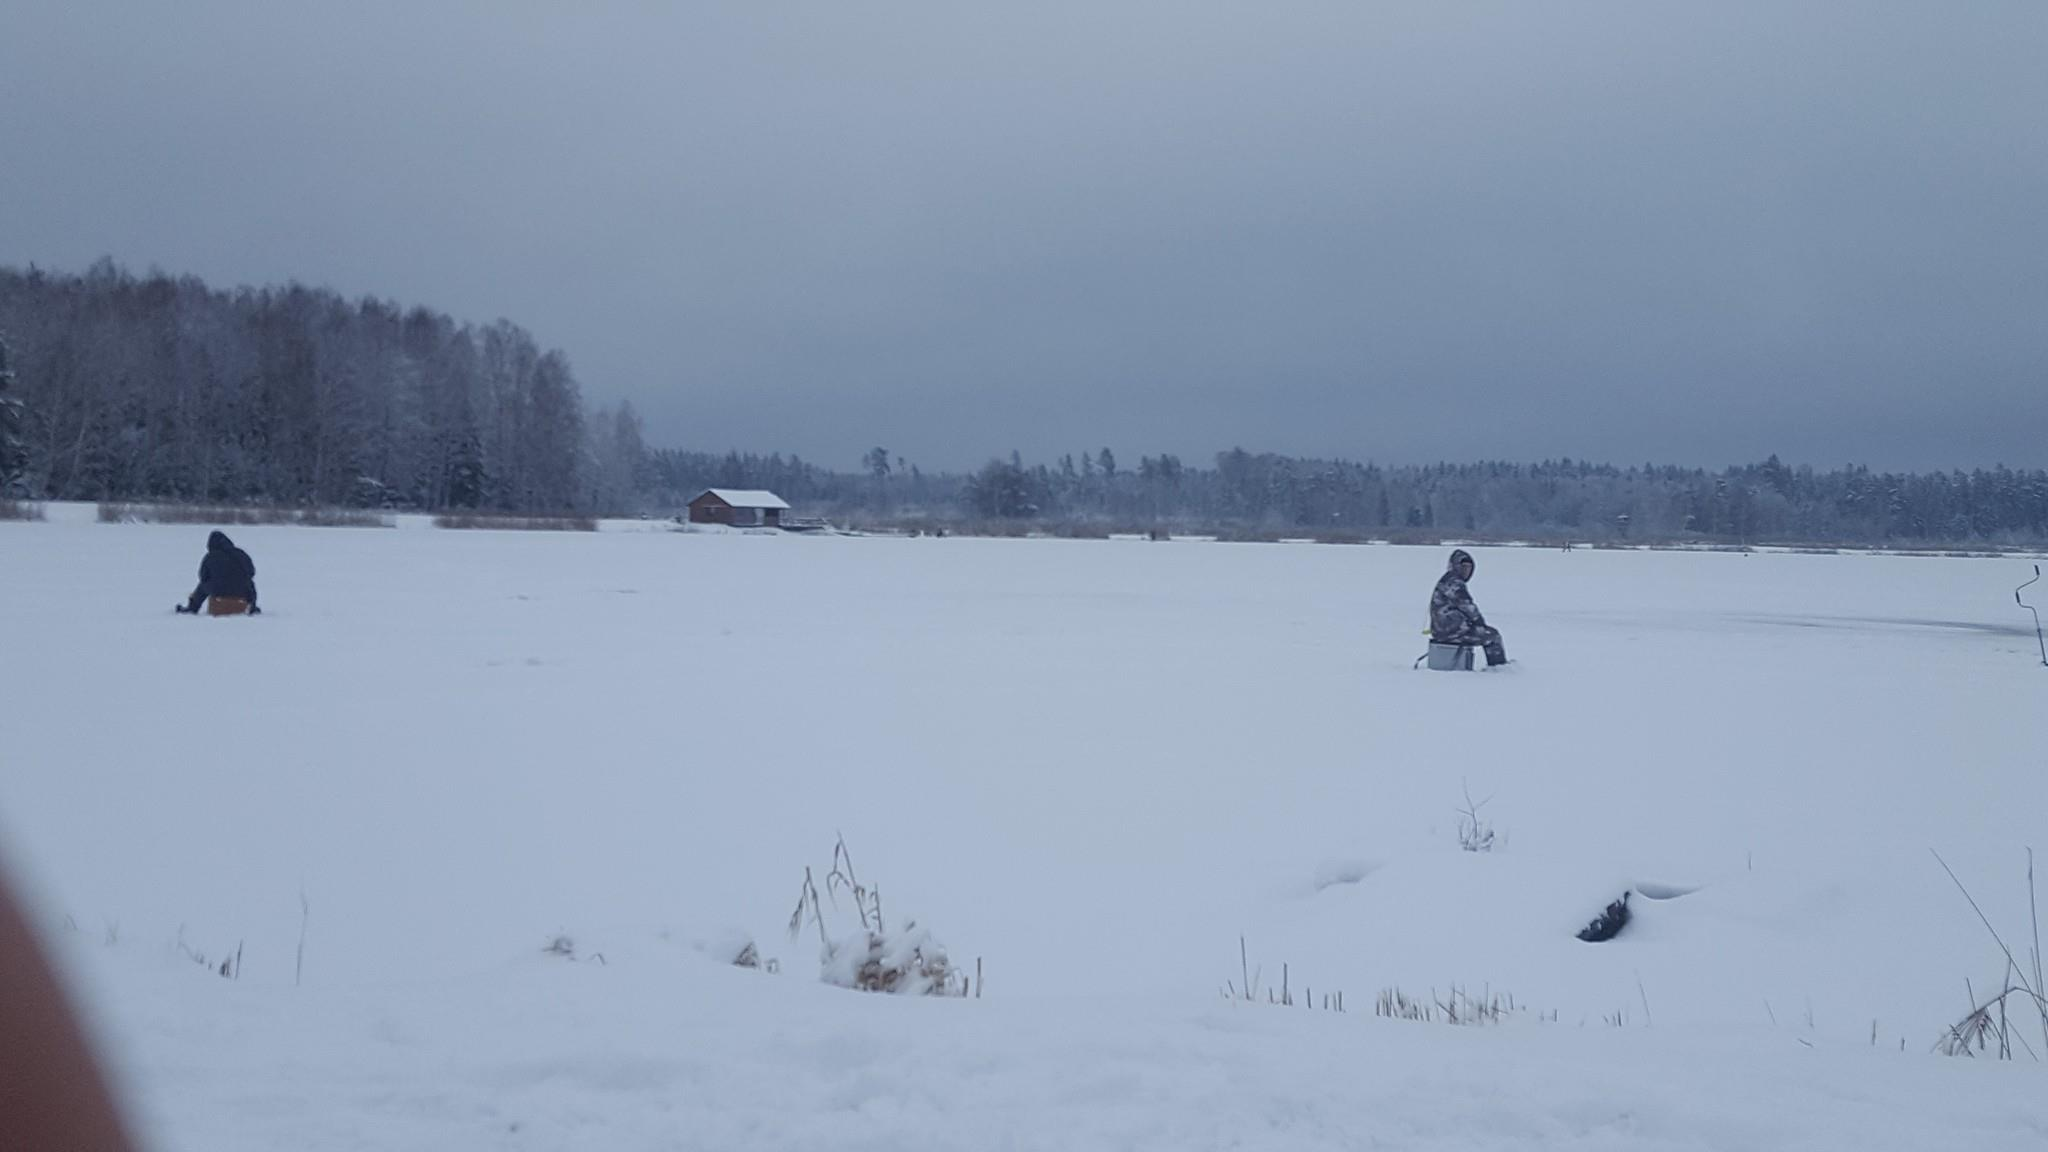 Žvejyba žiemą